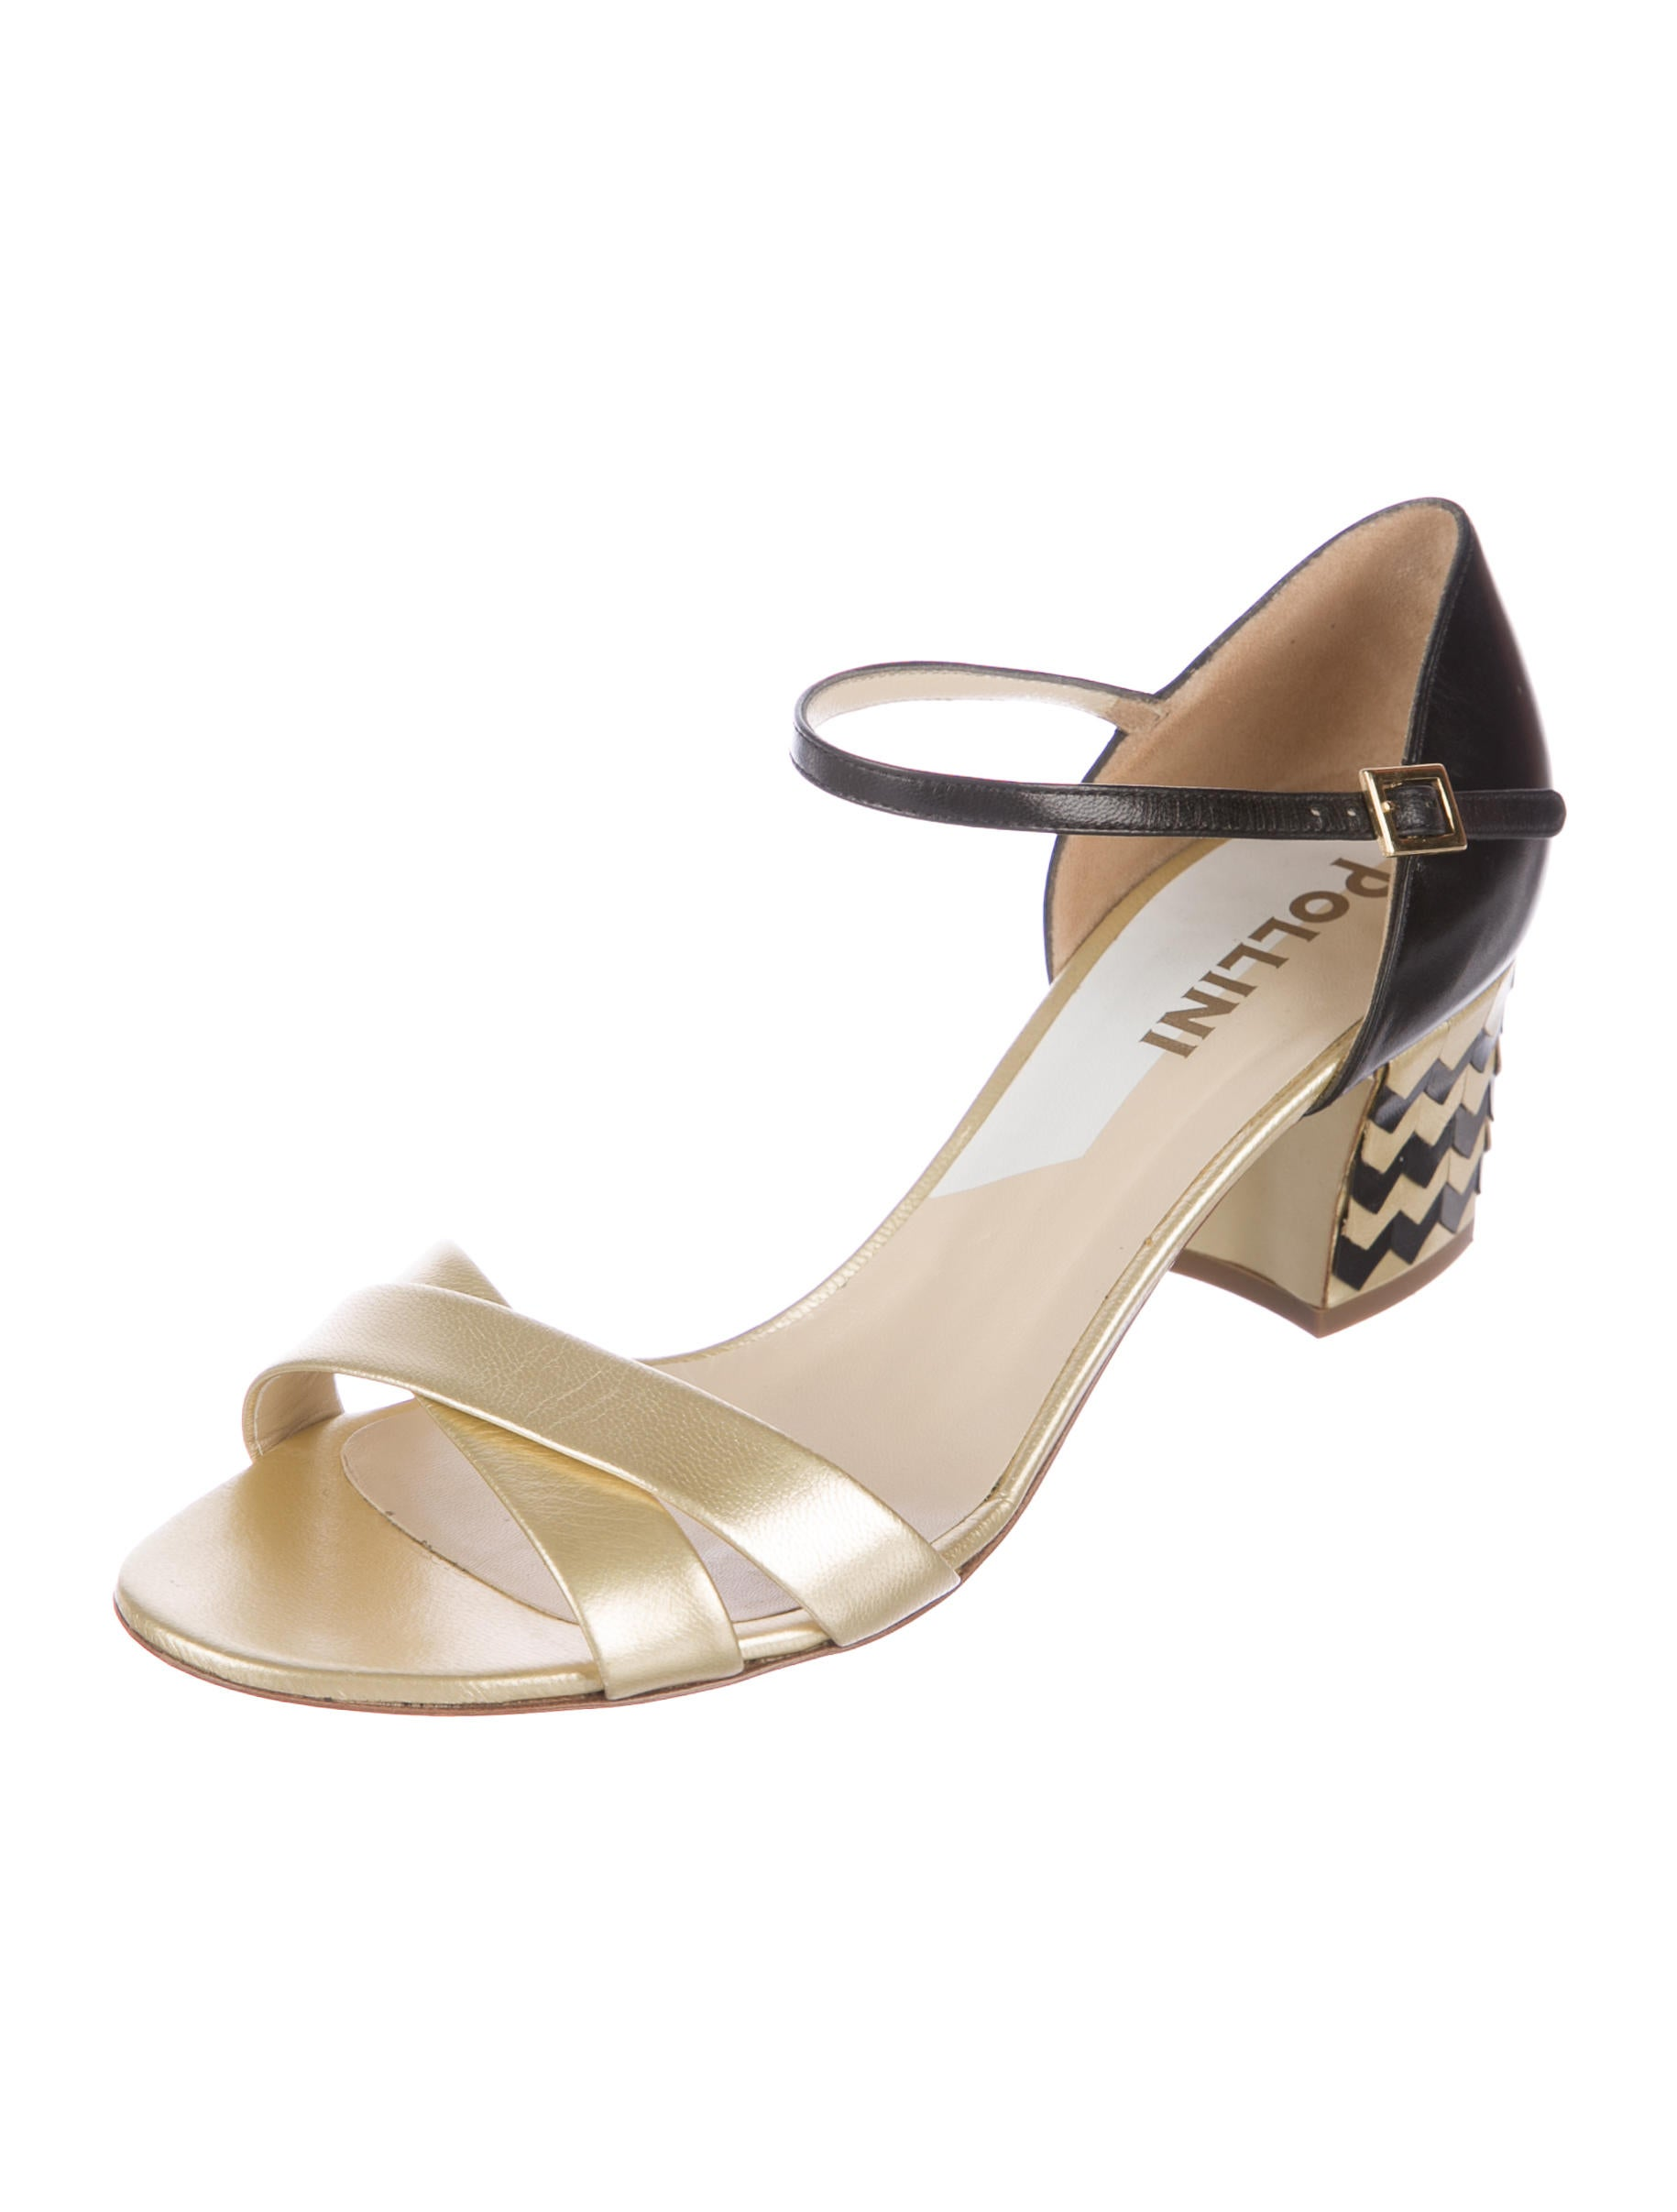 Pollini Metallic Chevron Sandals cheap professional OWjFBtoYb